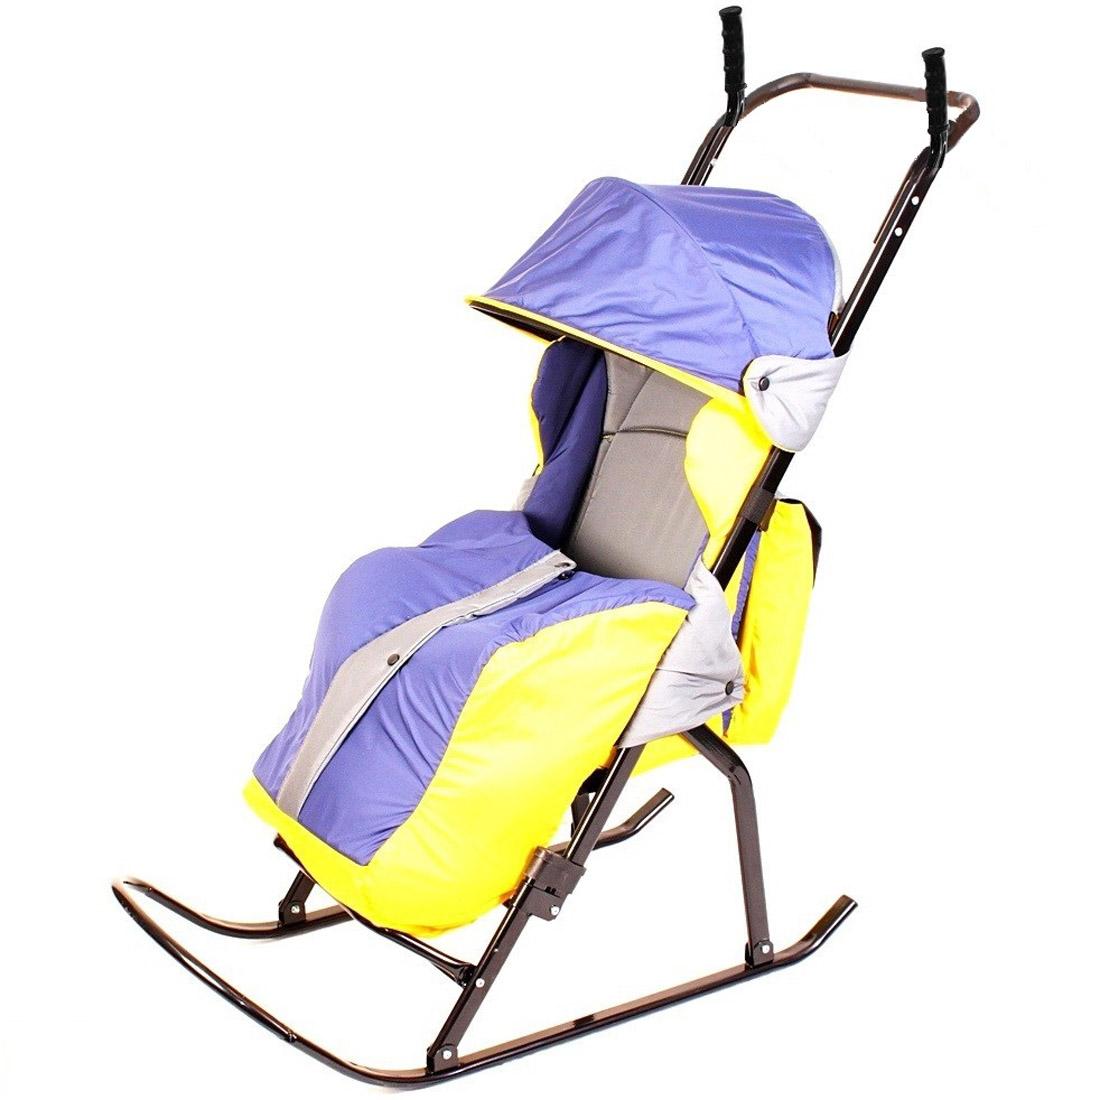 Санки-коляска RT Кенгуру-1 Серые с желтым и синим<br>